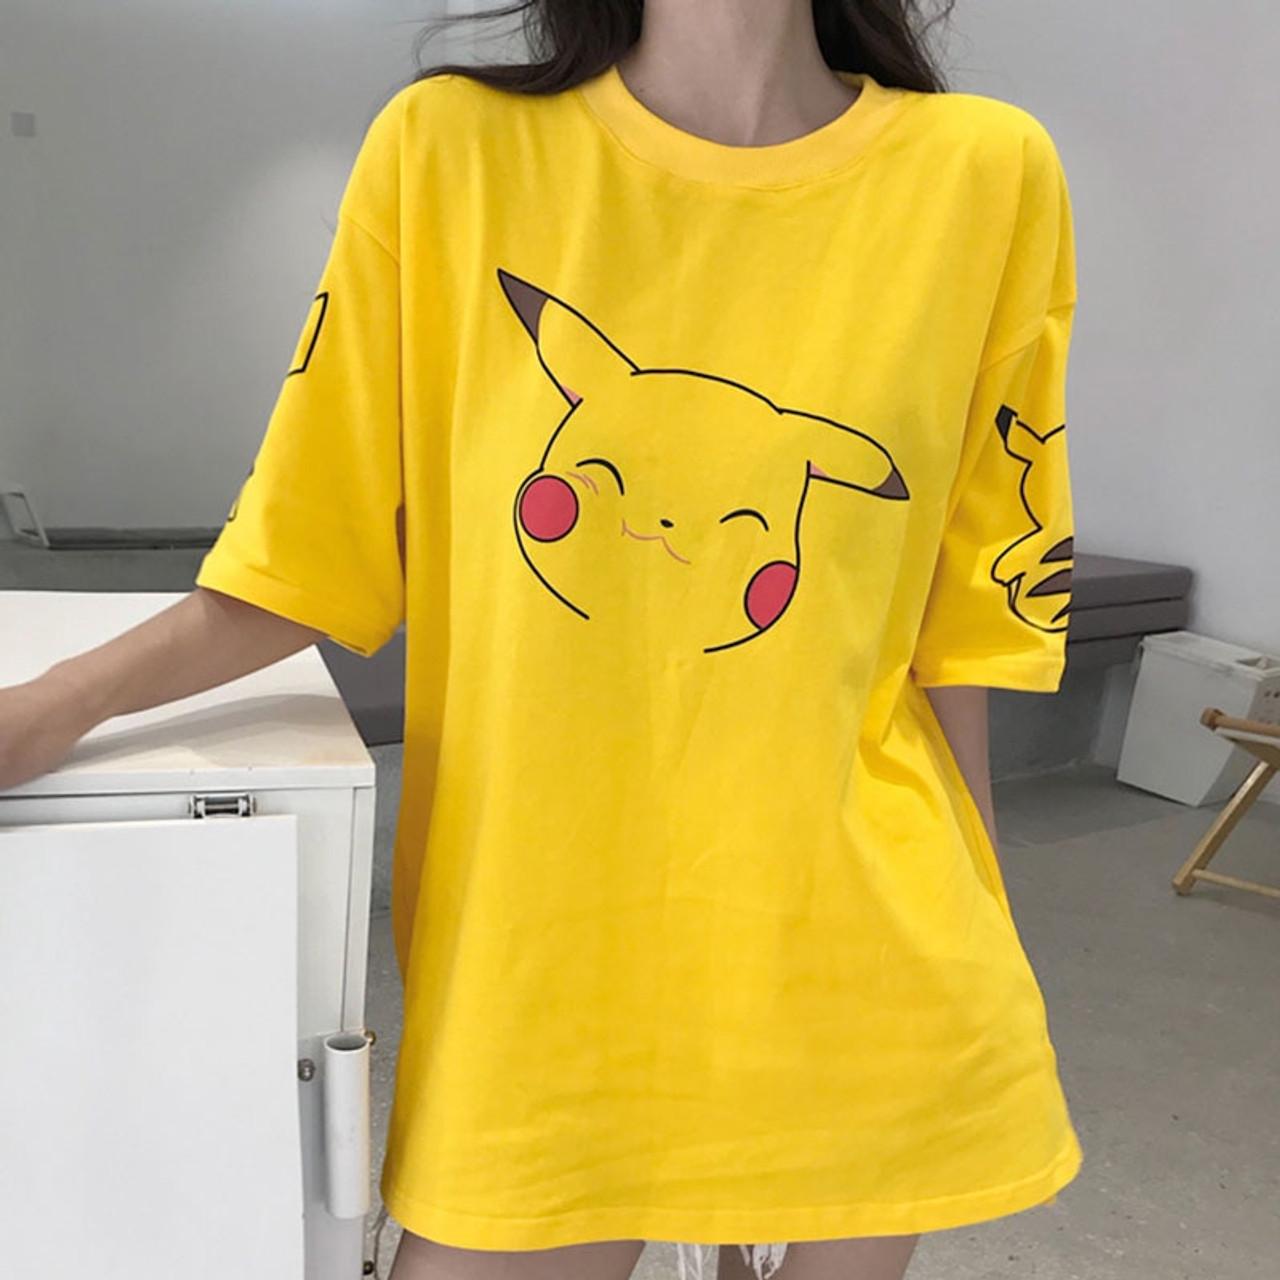 095d17f277 Harajuku Kawaii Cartoon Print Short Sleeve long T Shirt Tops Women Summer  Korean Fashion Yellow Cute ...